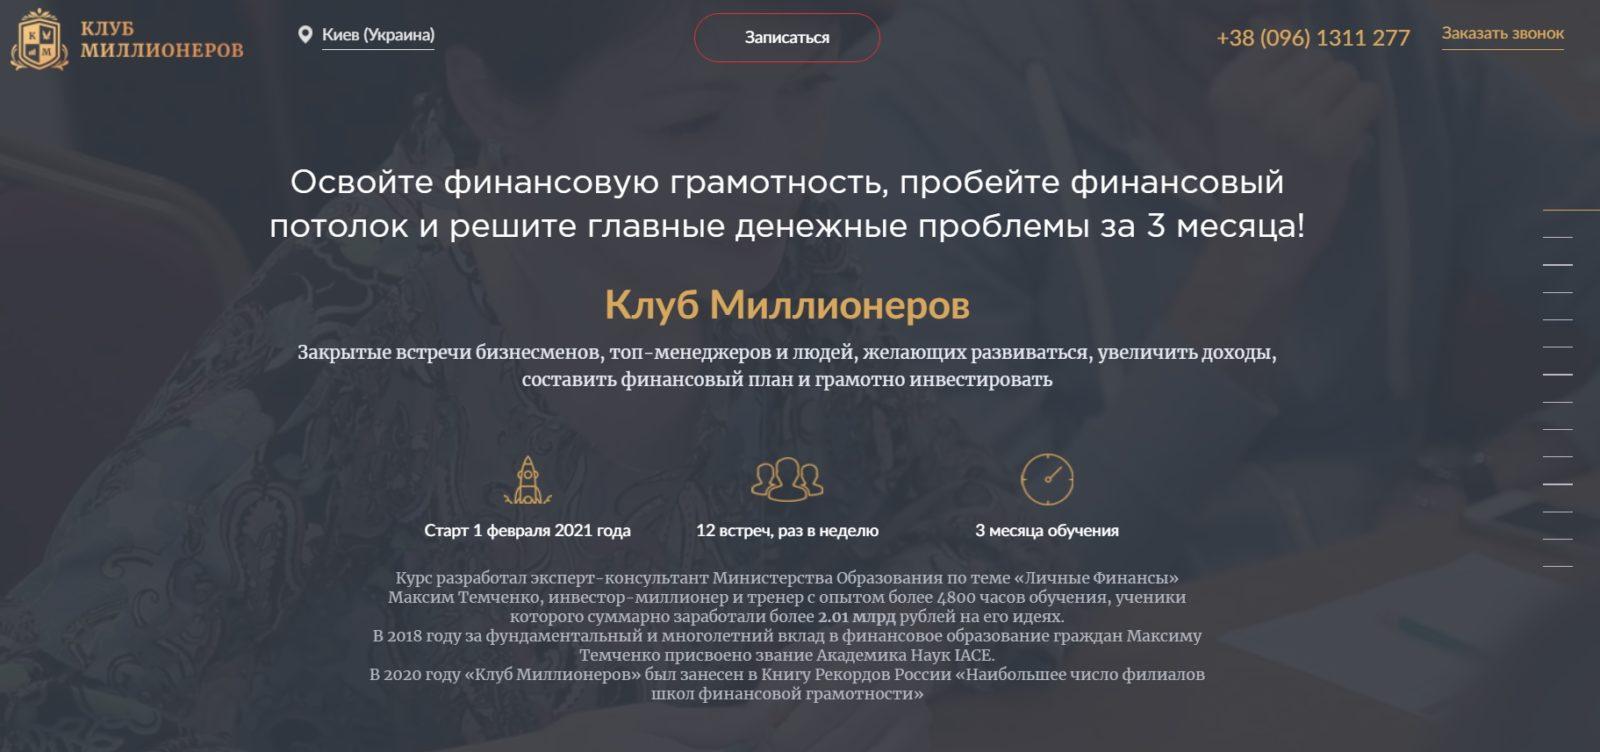 Сайт Клуба миллионеров Максима Темченко